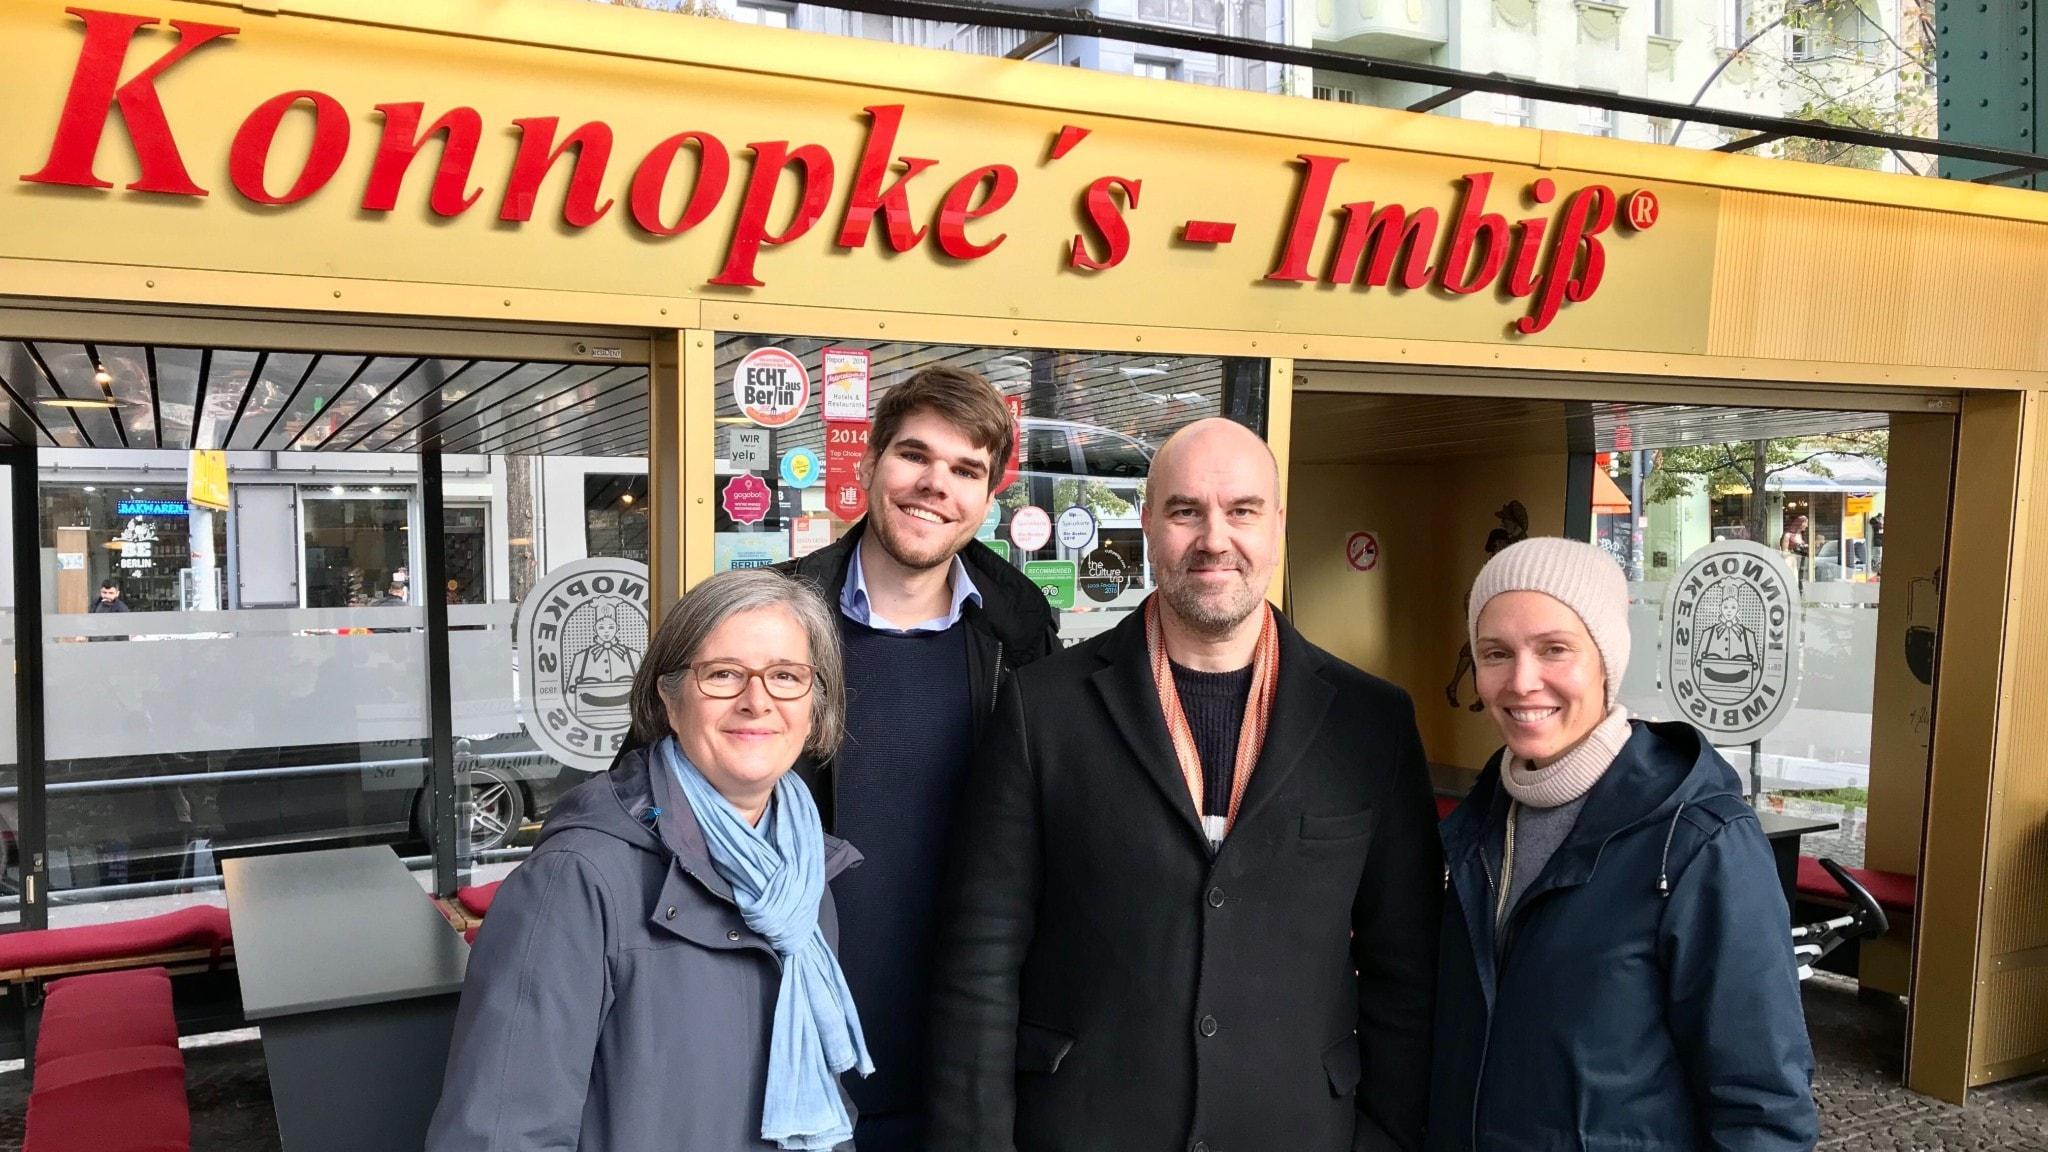 Daniela Marquardt, Alexander Finger, Claes Aronsson och Caroline Salzinger.